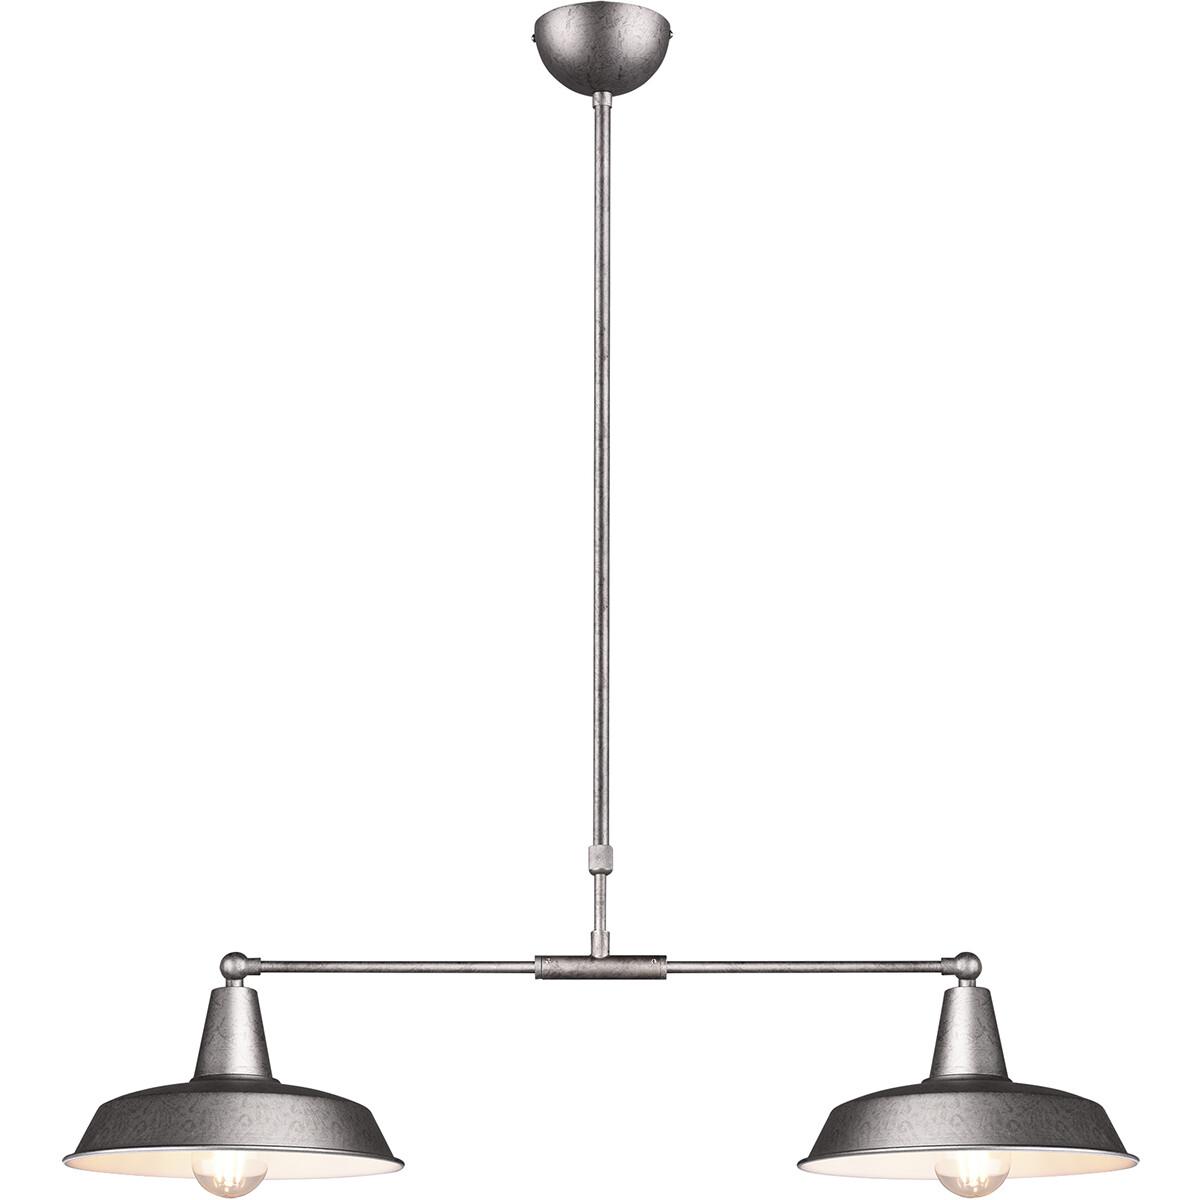 LED Hanglamp - Hangverlichting - Trion Wolta - E27 Fitting - 2-lichts - Rond - Antiek Nikkel - Alumi